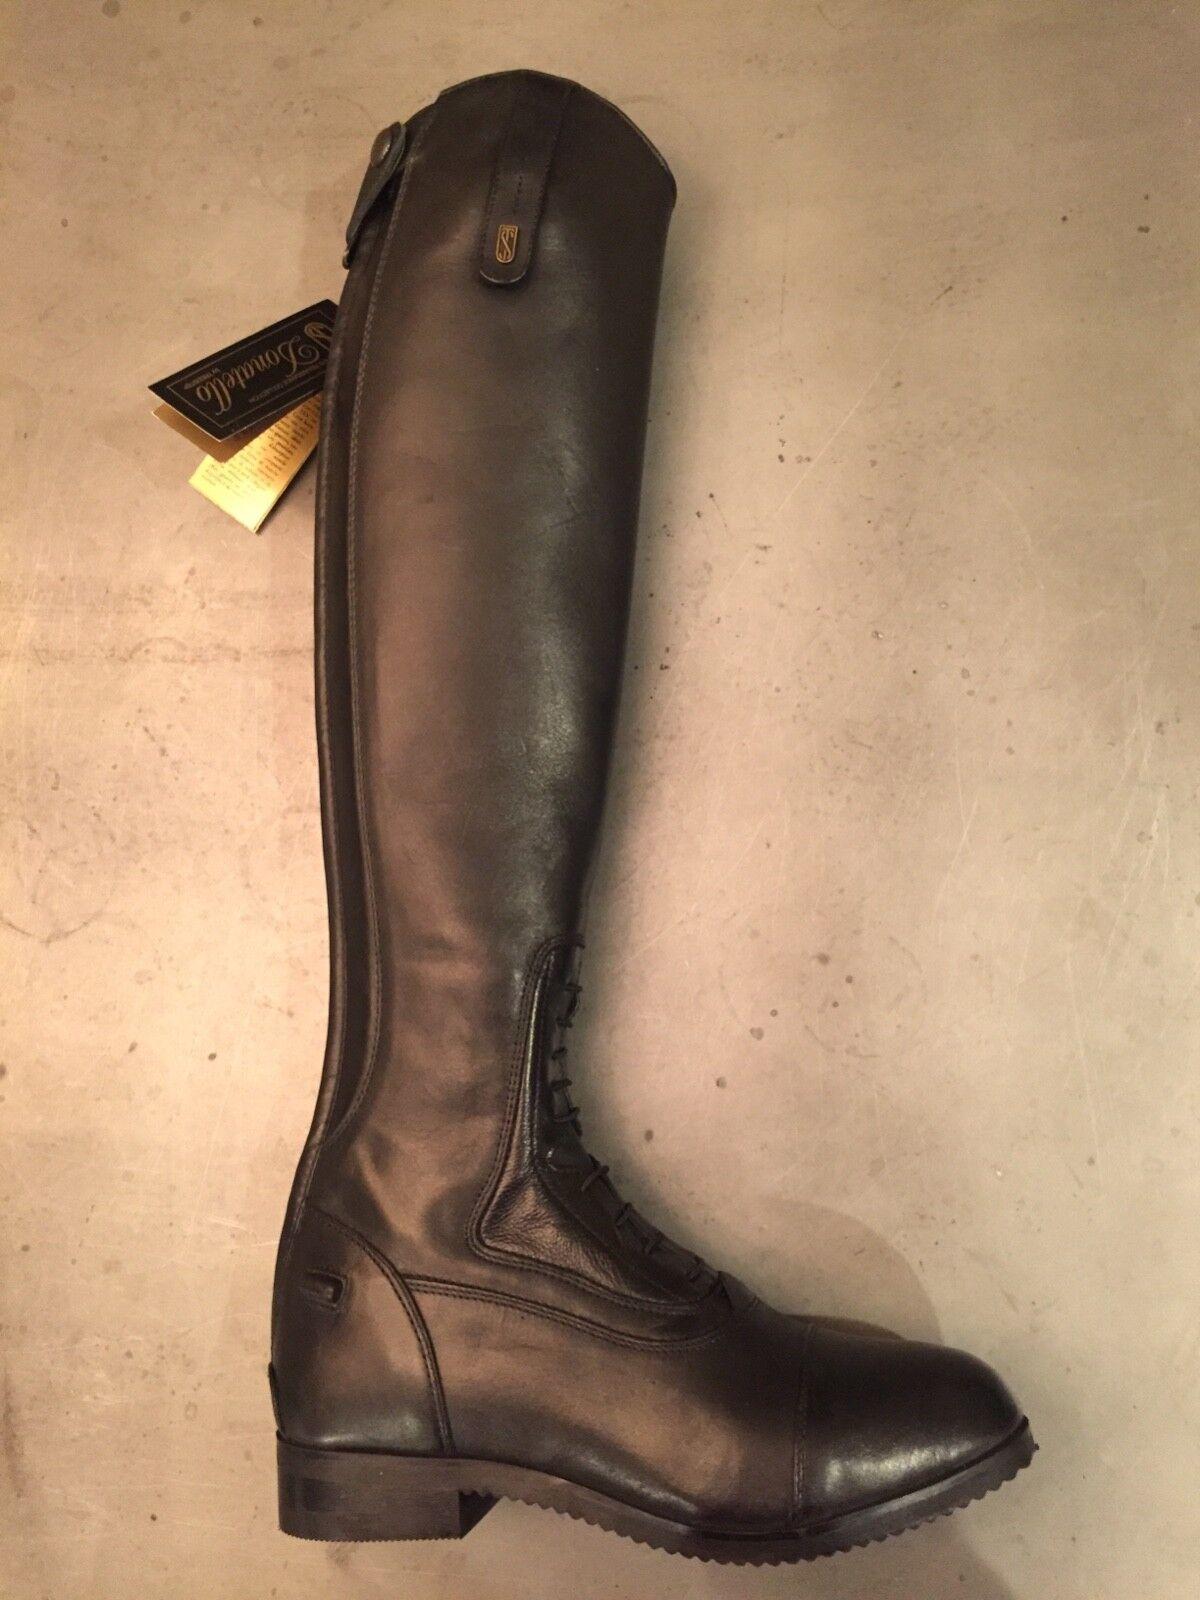 "NEW Tredstep Donatello field boots, size 6 1 2-7, R calf 13 1 2"" Reg ht 17 1 3"""